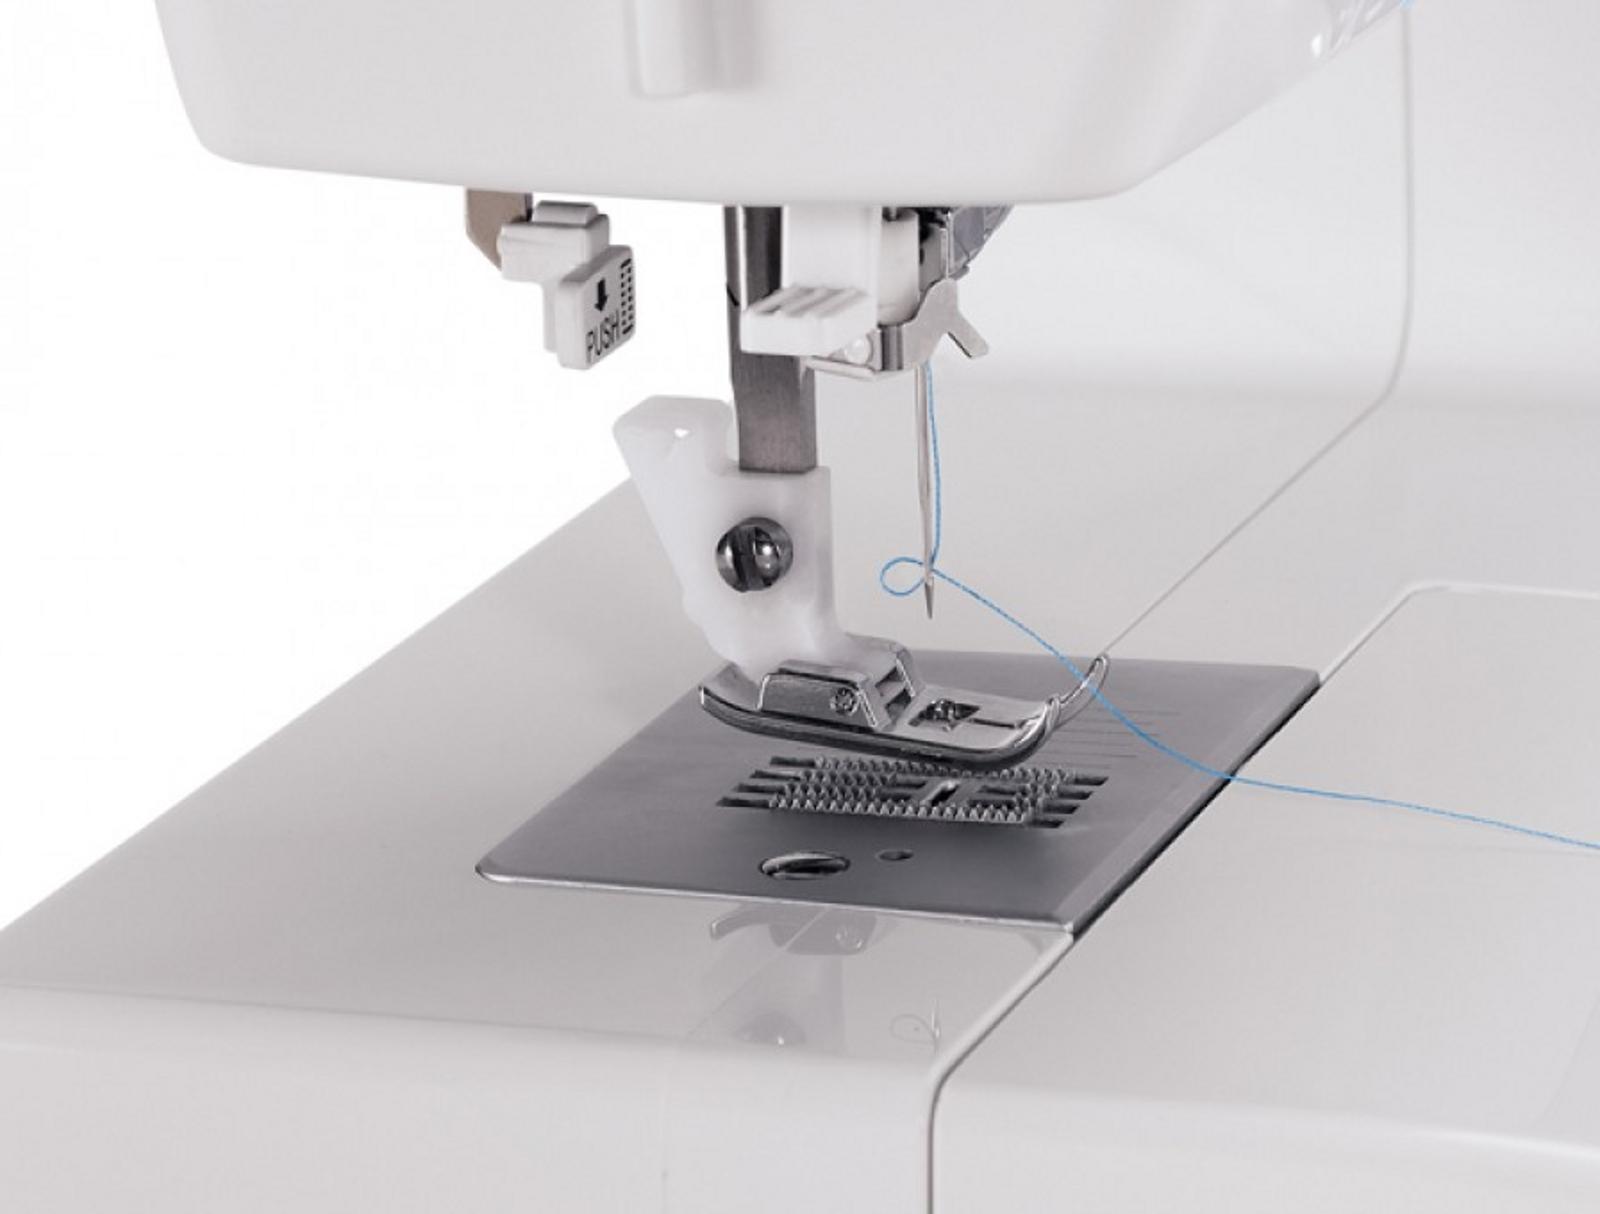 Singer Basic 21-Stitch Simple Sewing Machine